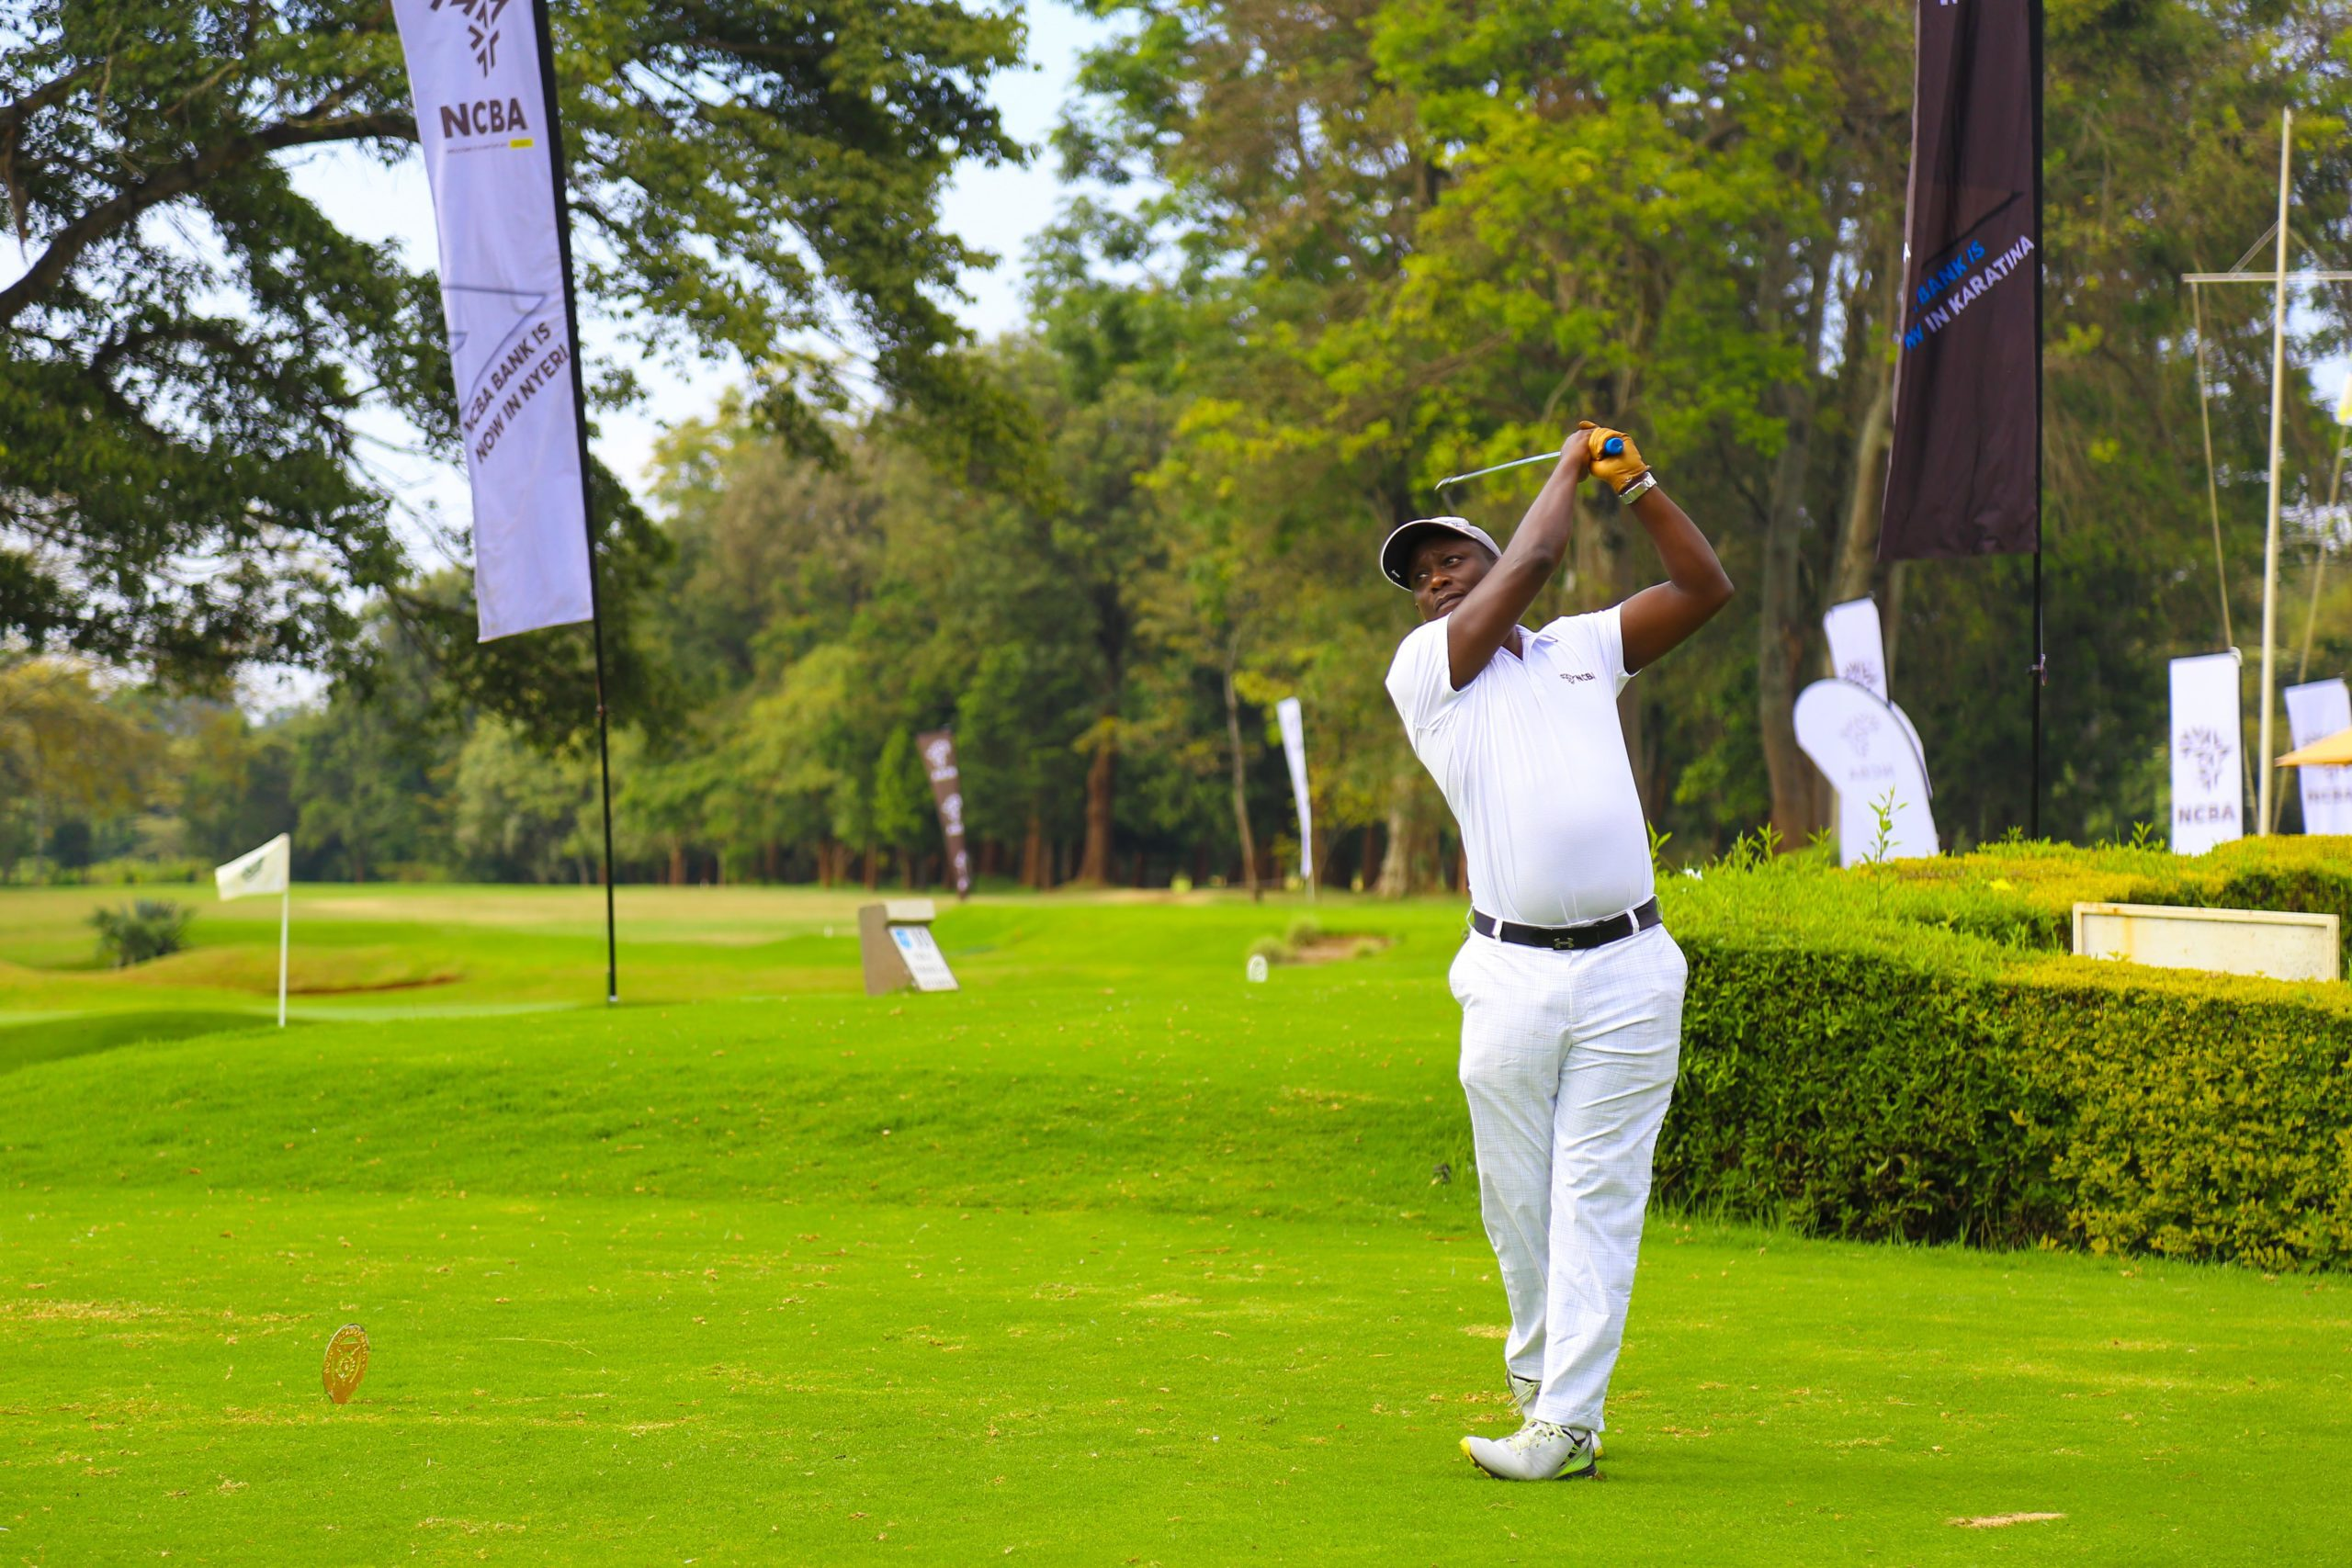 Nakuru to host 11th leg of NCBA Golf Series